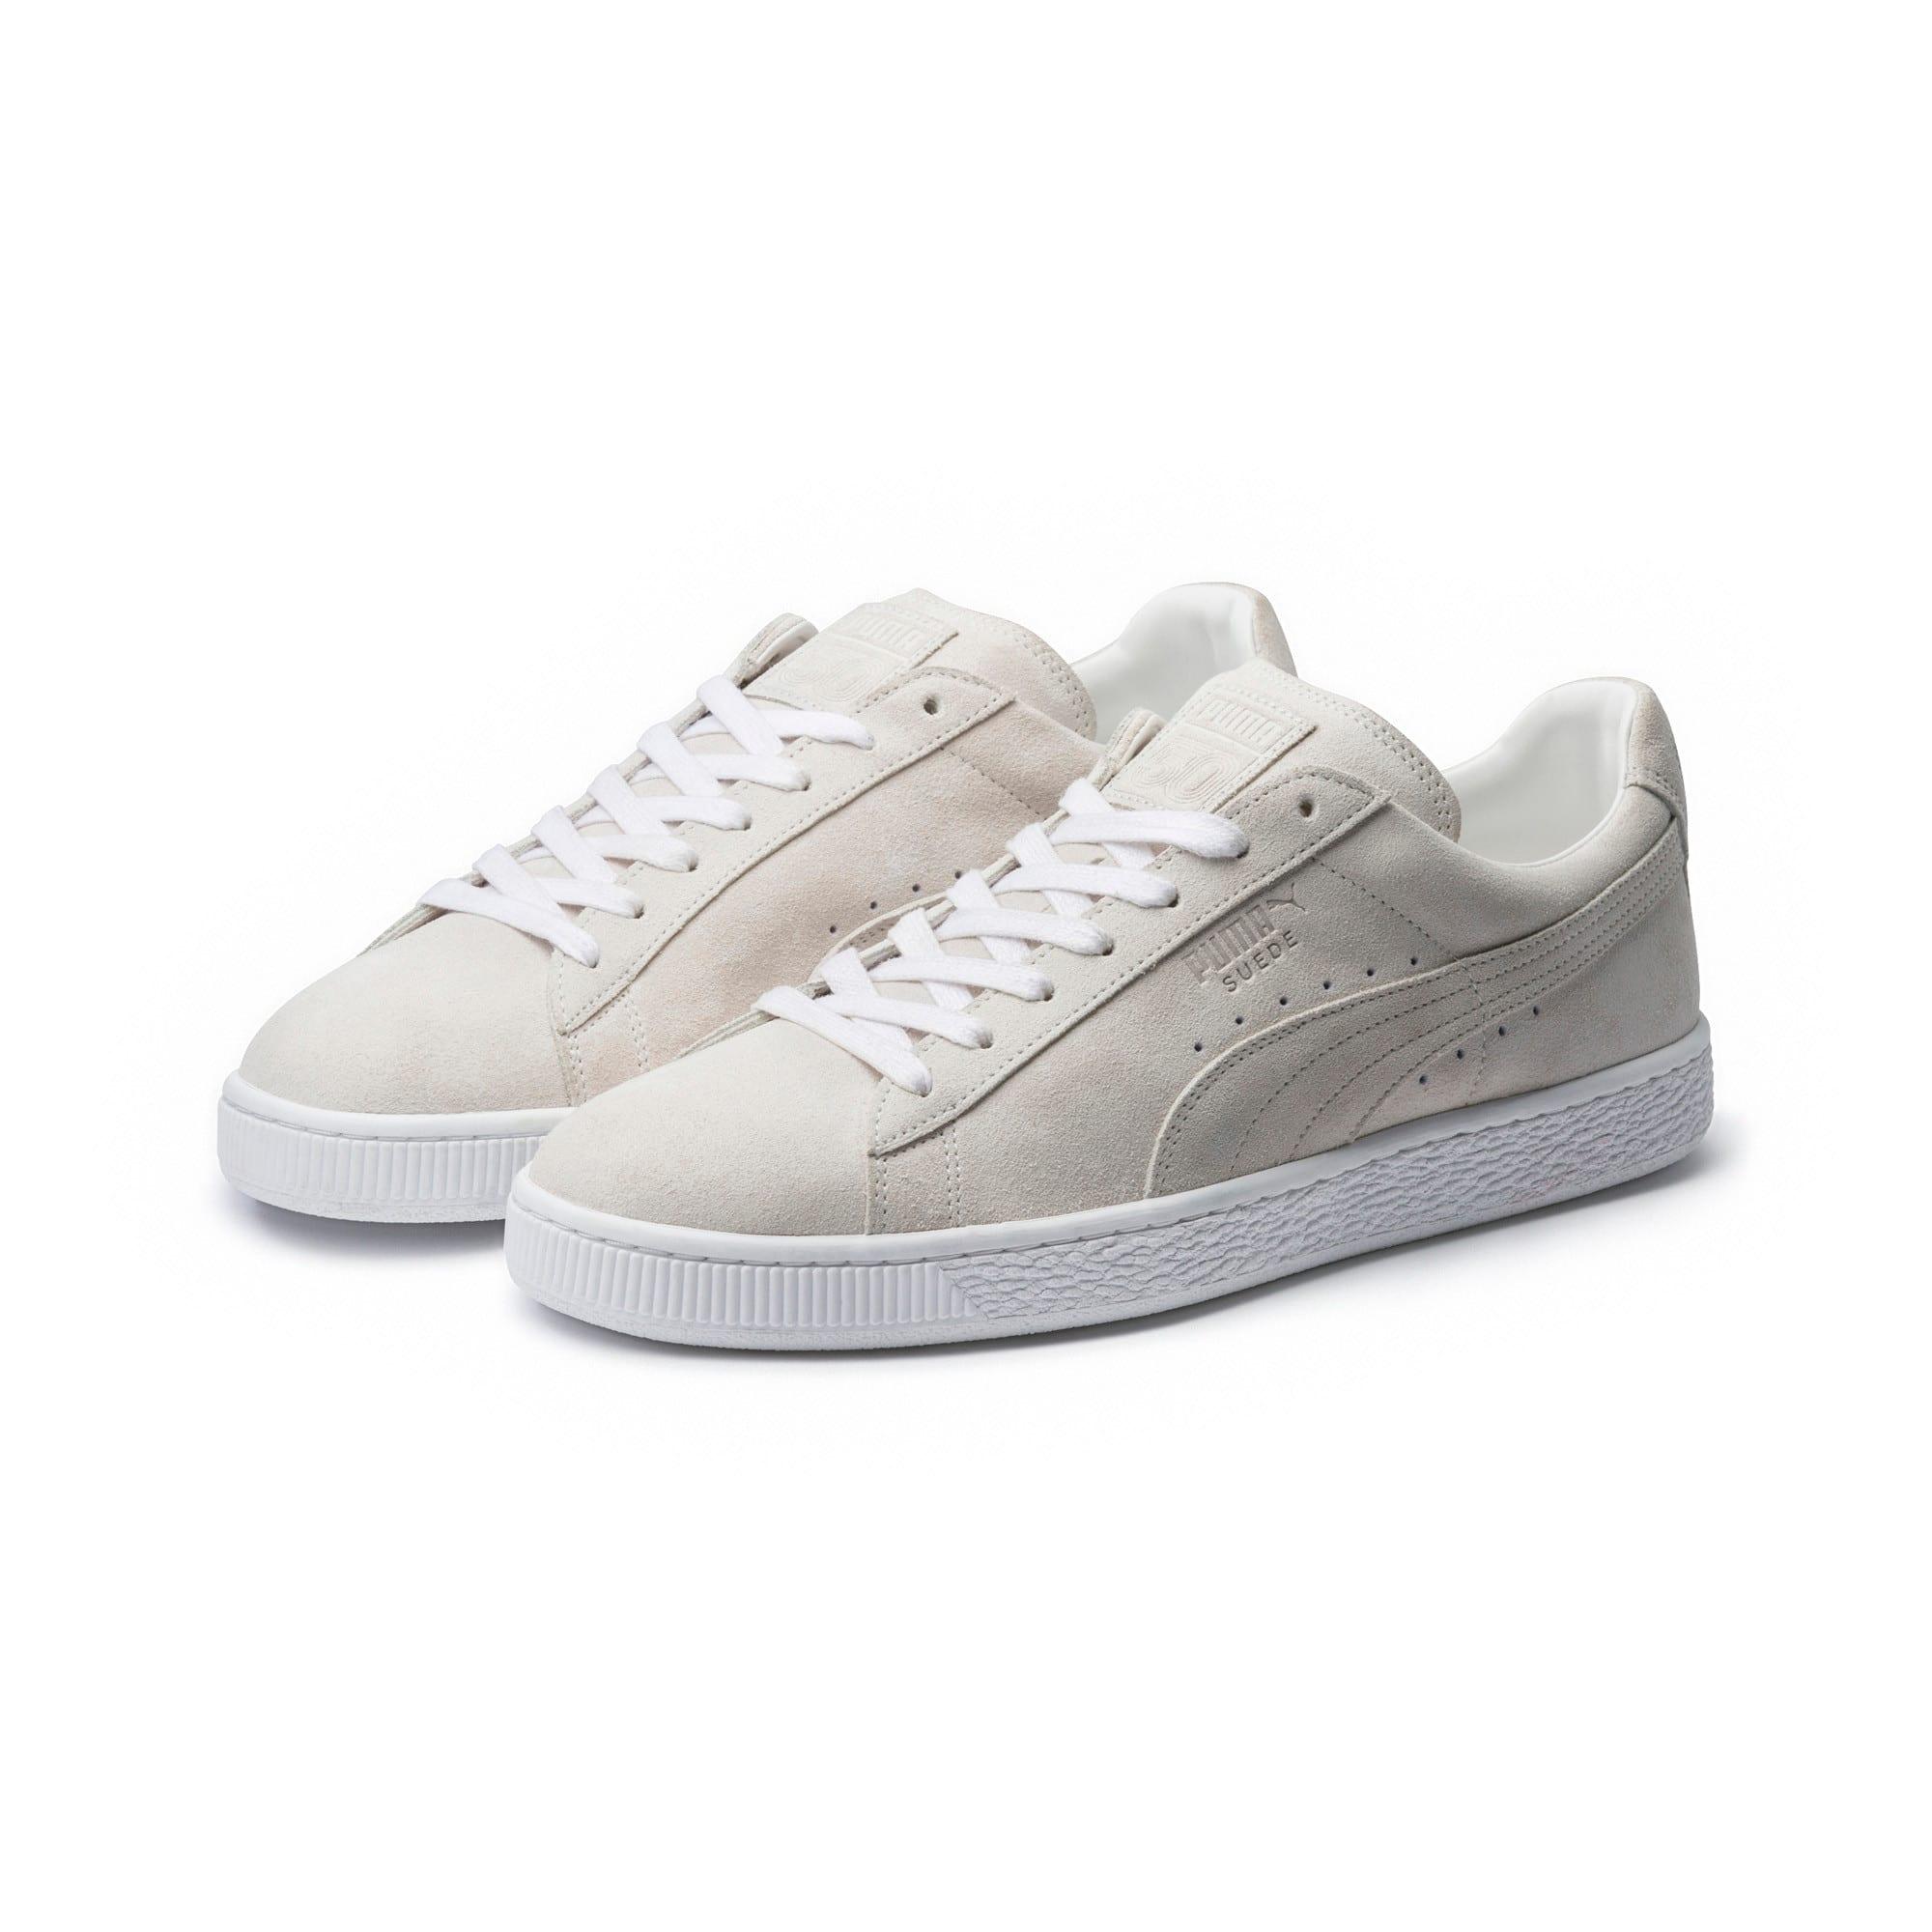 Thumbnail 2 of Suede Classic White Sneakers, Puma White-Puma White, medium